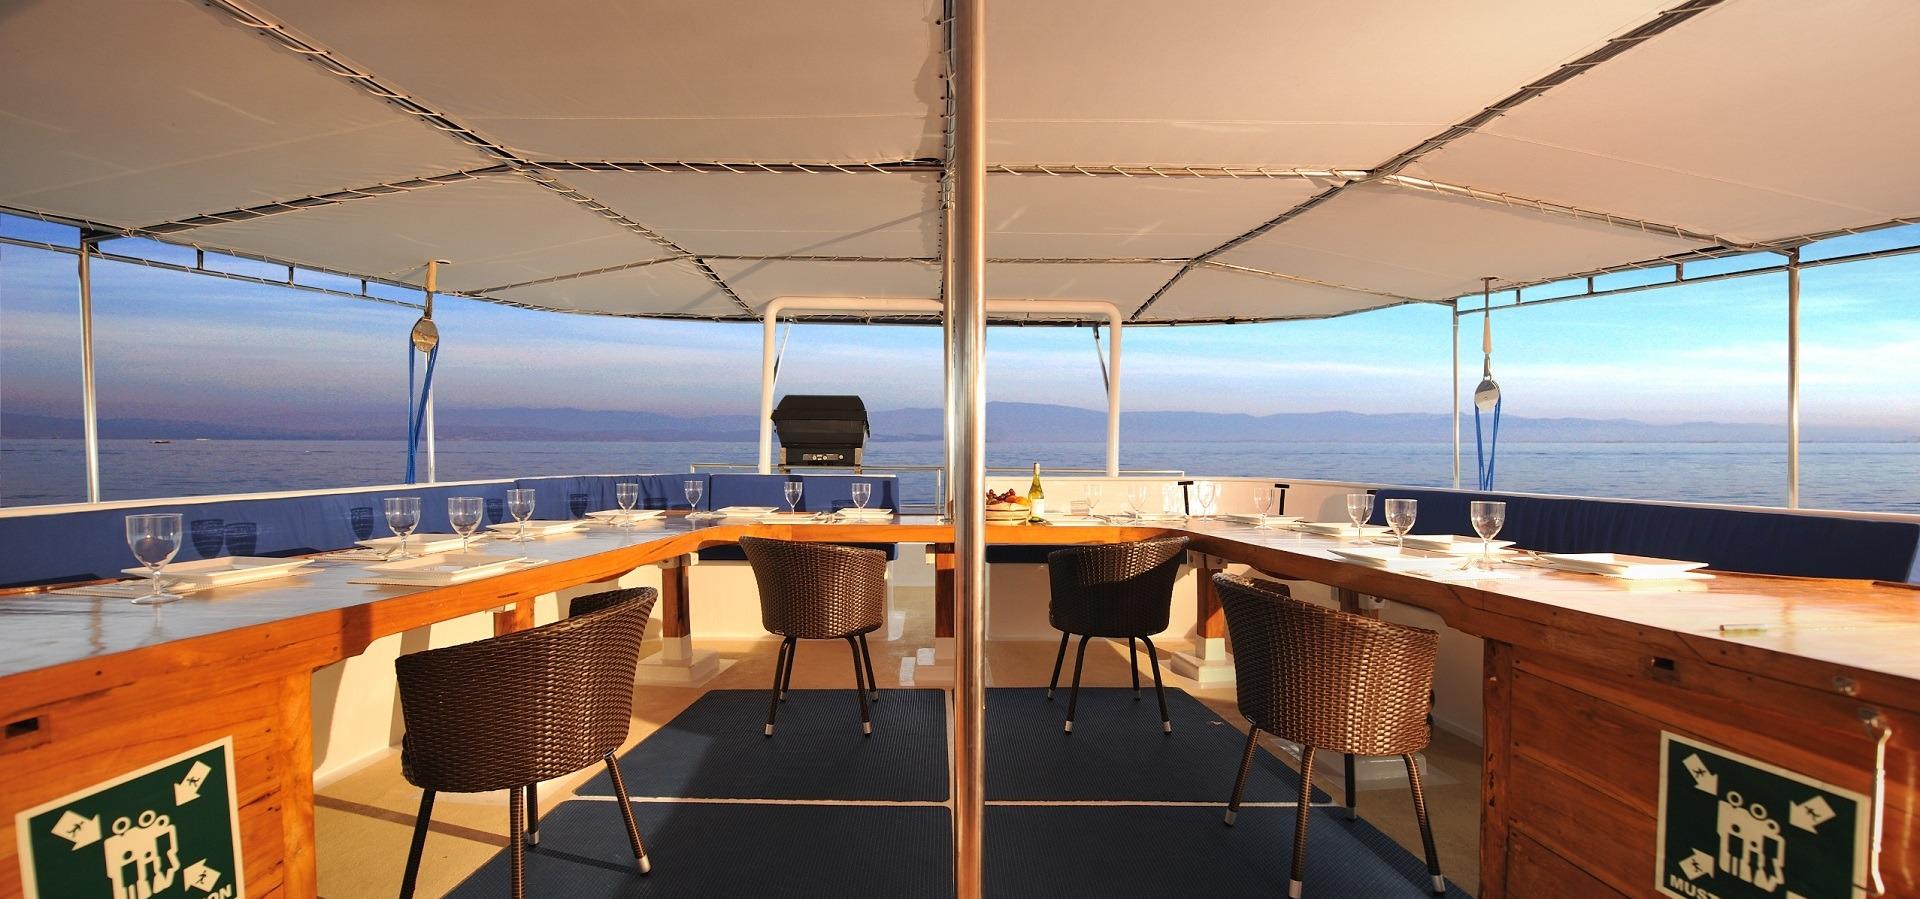 Indonesia, Indo Siren, Yacht, image,